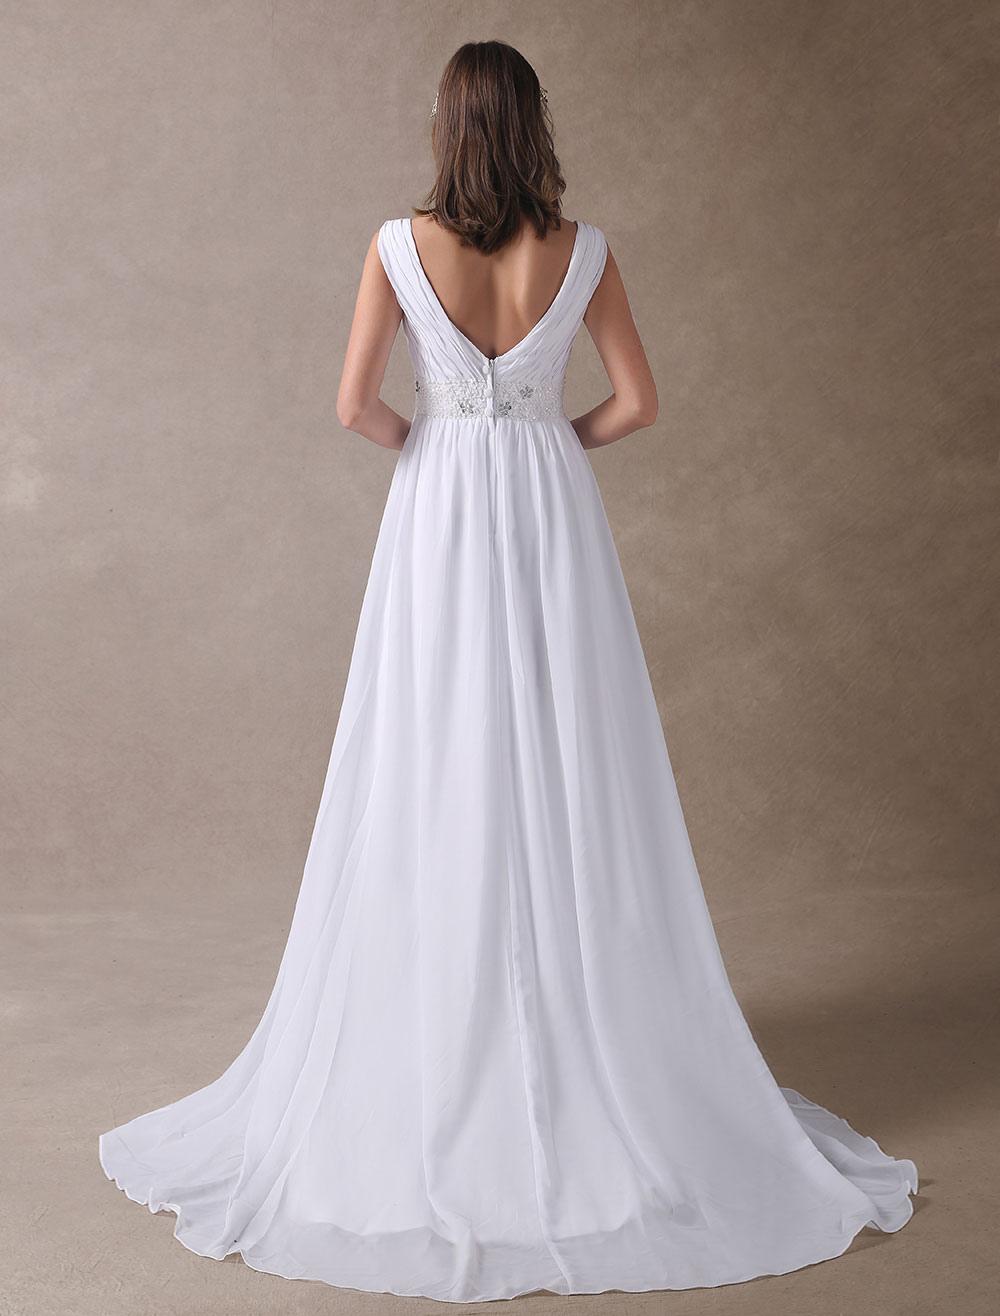 ad36fe5a4ec1 Summer Wedding Dresses White Empire Waist V Neck Beaded Chiffon Beach  Bridal Gowns-No.